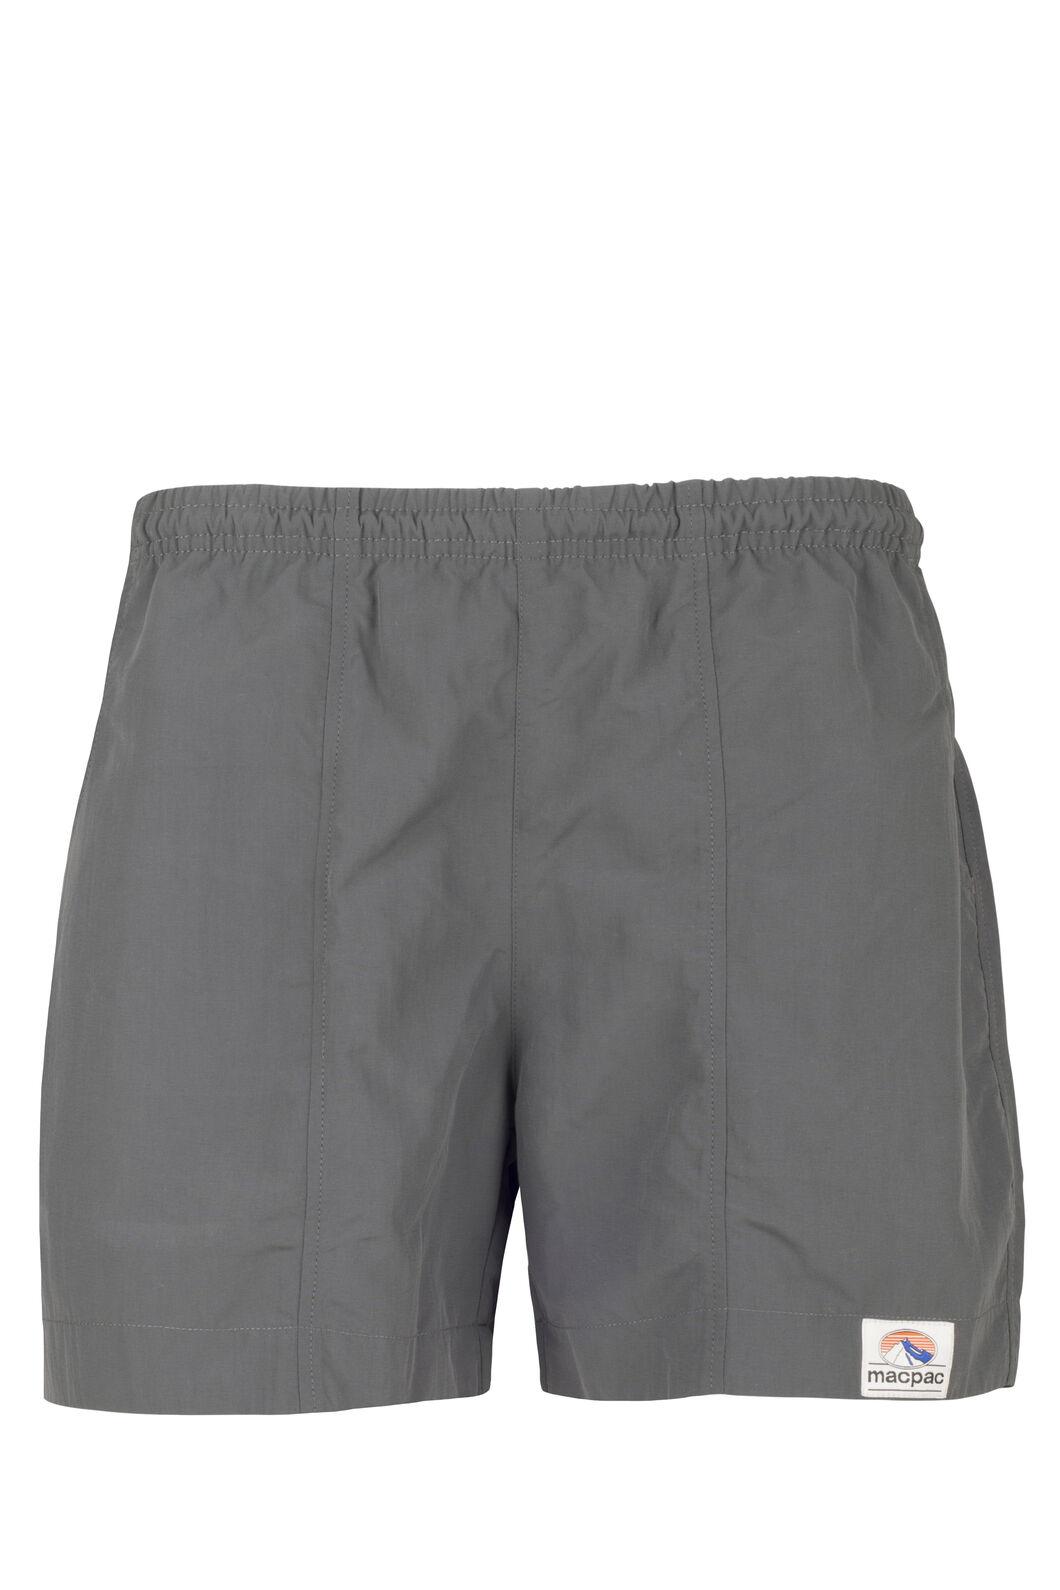 Macpac Winger Shorts - Women's, Asphalt, hi-res